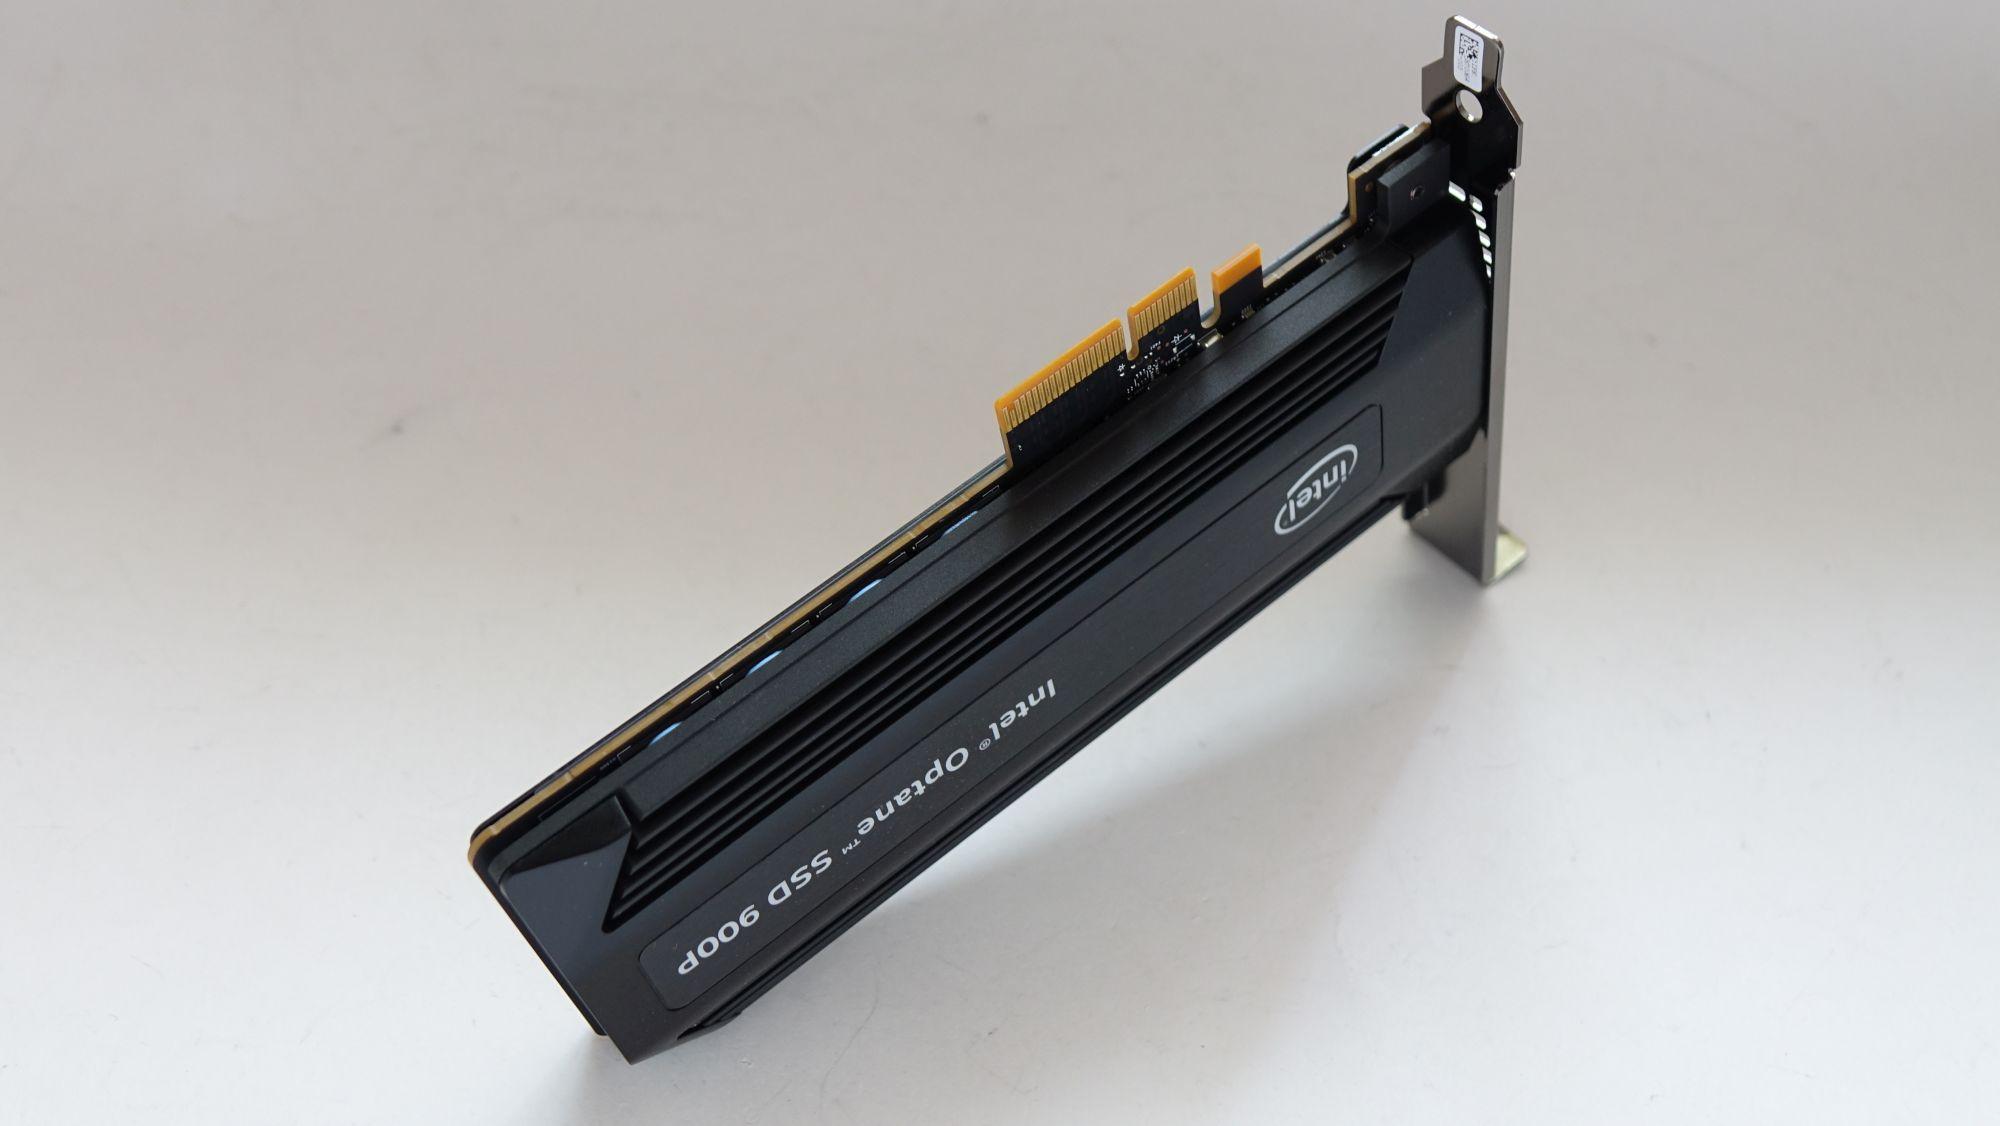 Intel Optane 900P 280